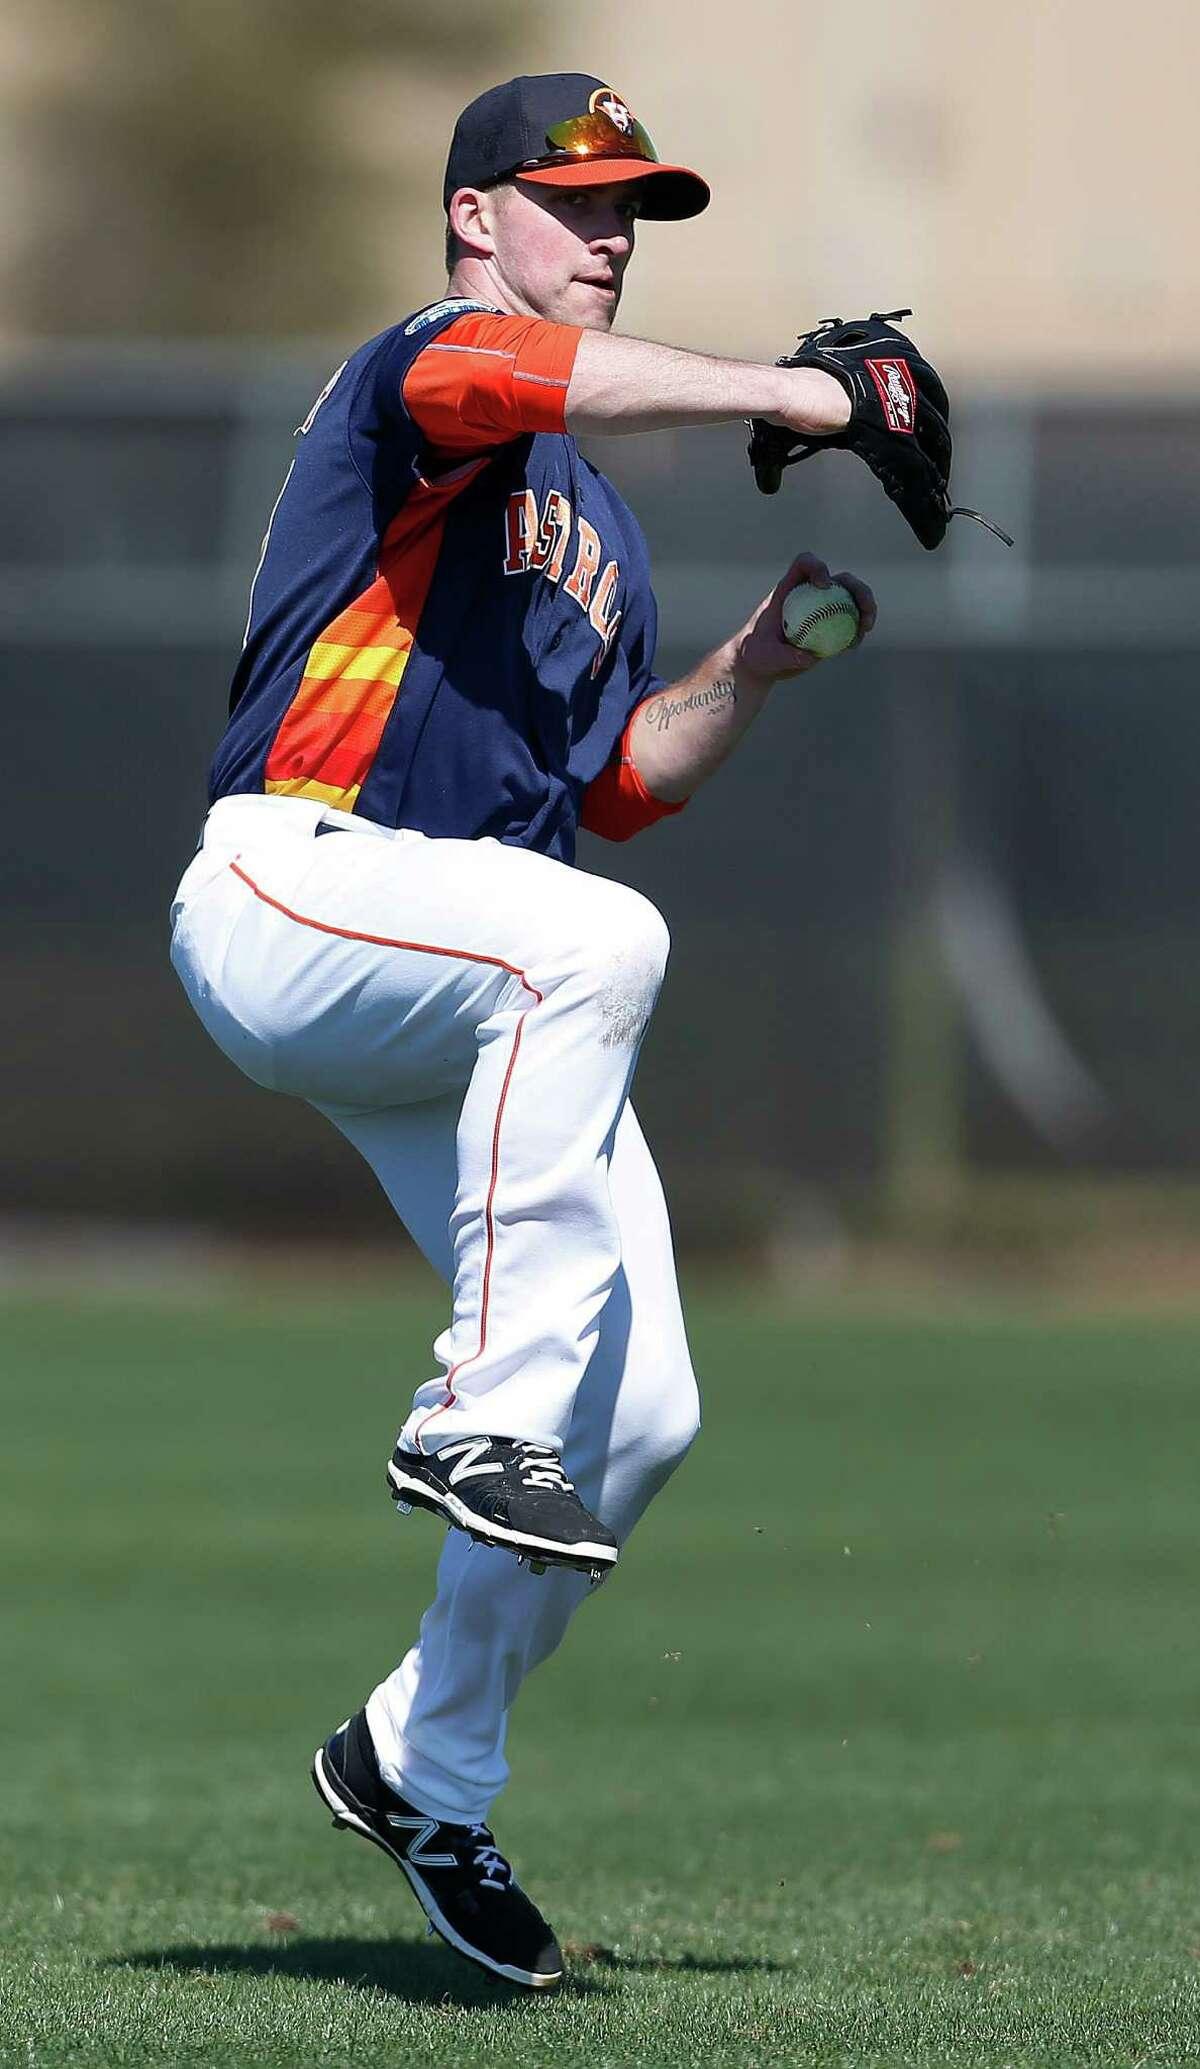 Houston Astros outfielder Jon Kemmer during the Astros spring training in Kissimmee, Florida, Thursday, Feb. 25, 2016.